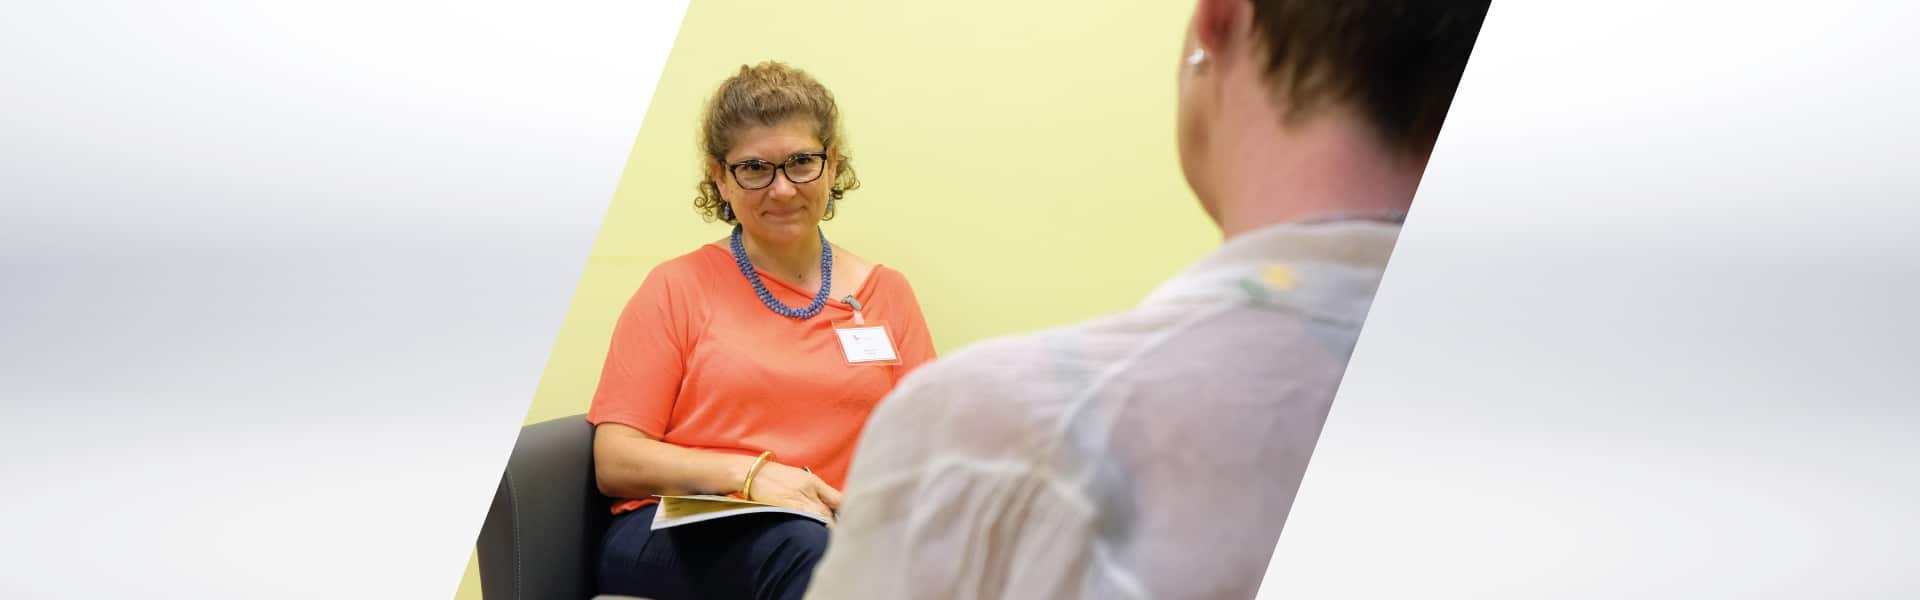 Hospice Testimonianze LILT BIELLA